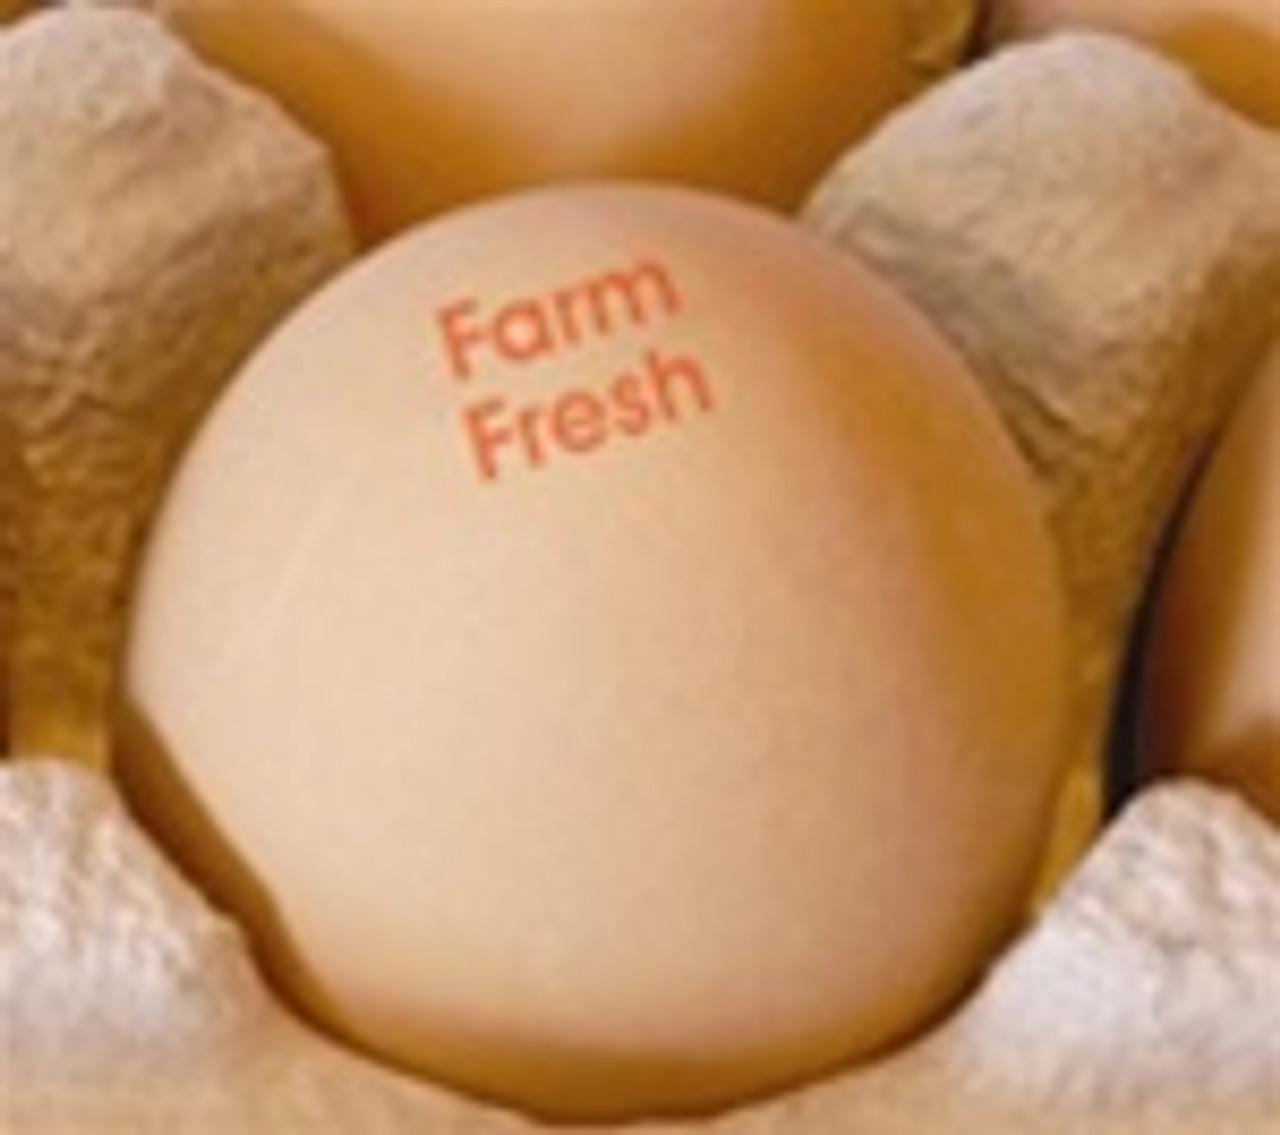 Egg Stamp - Text - Farm Fresh